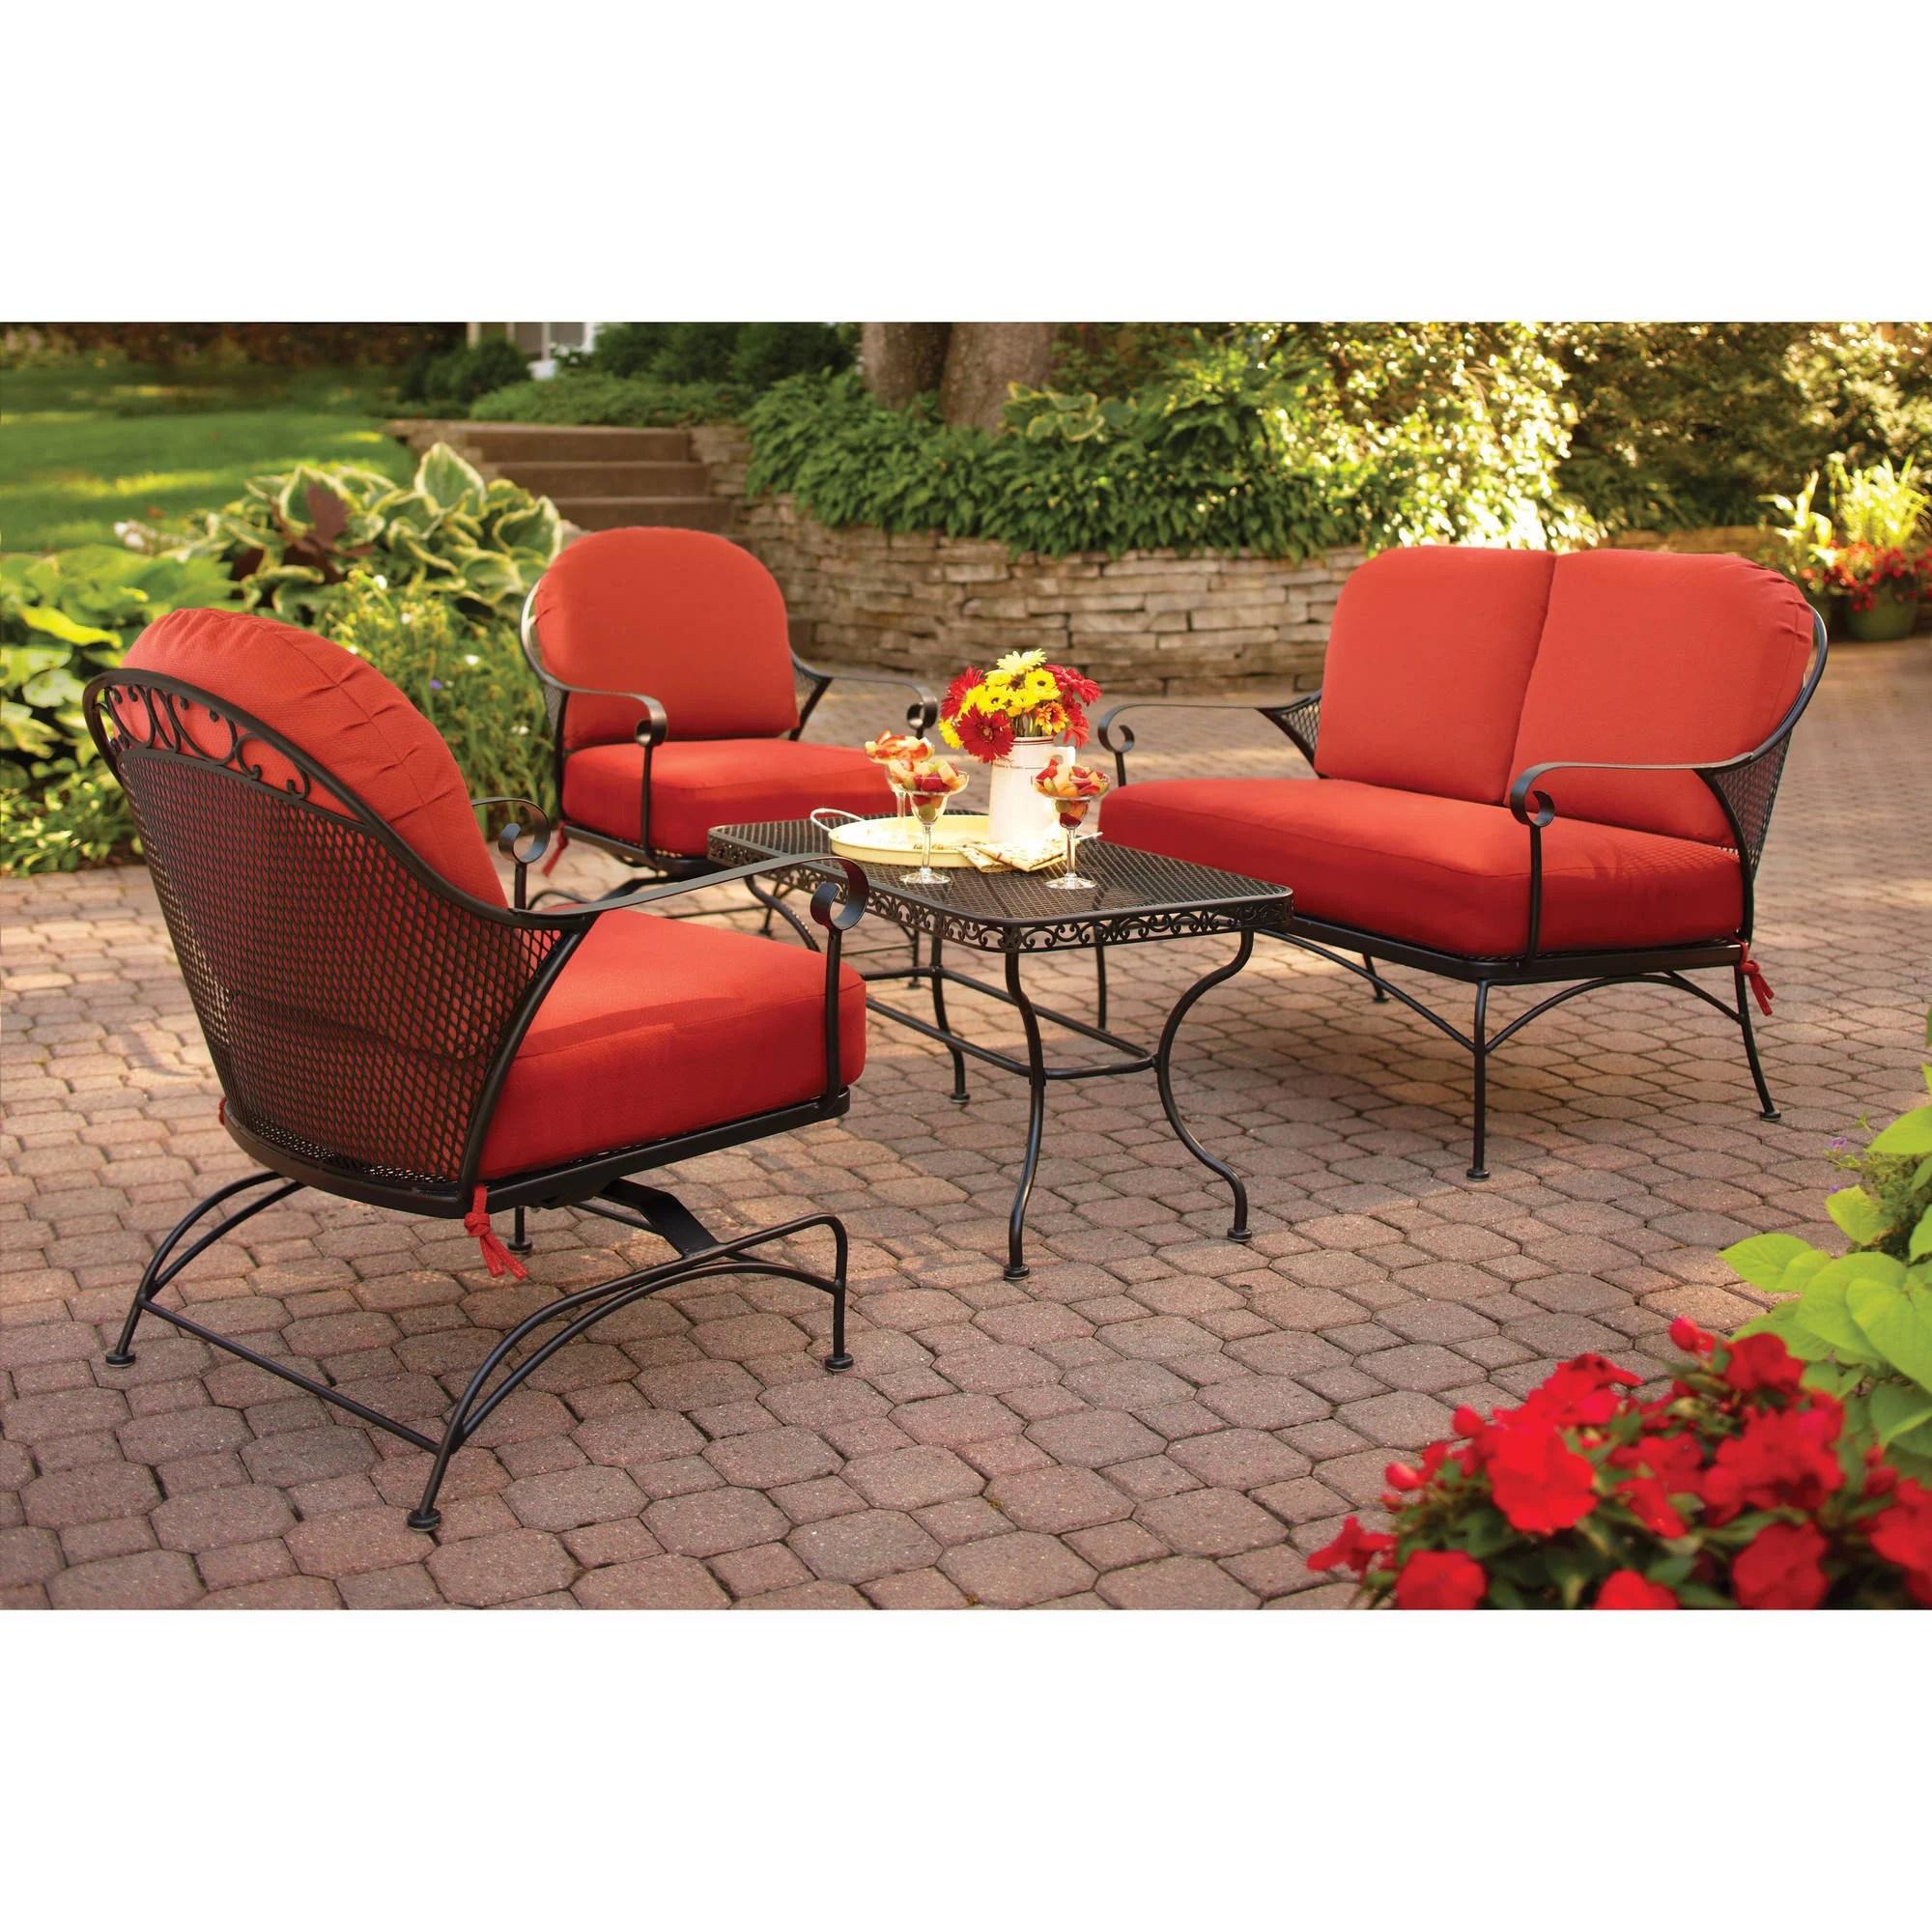 better homes gardens clayton court 4 piece patio furniture conversatio set metal walmart com